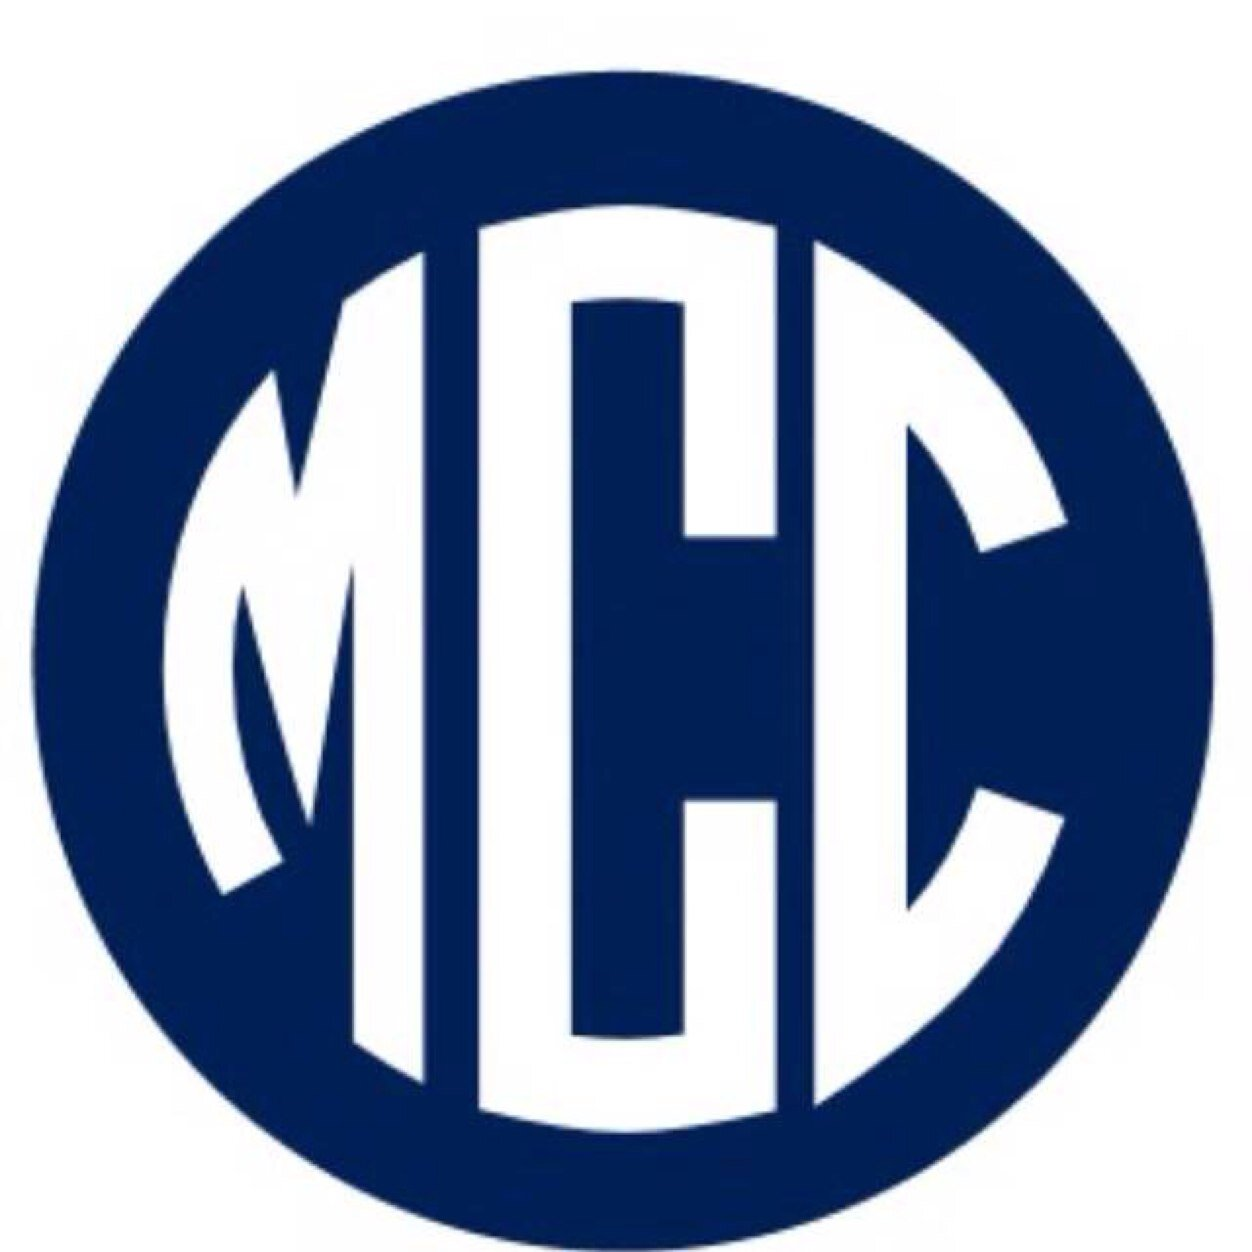 be mcc - photo #38